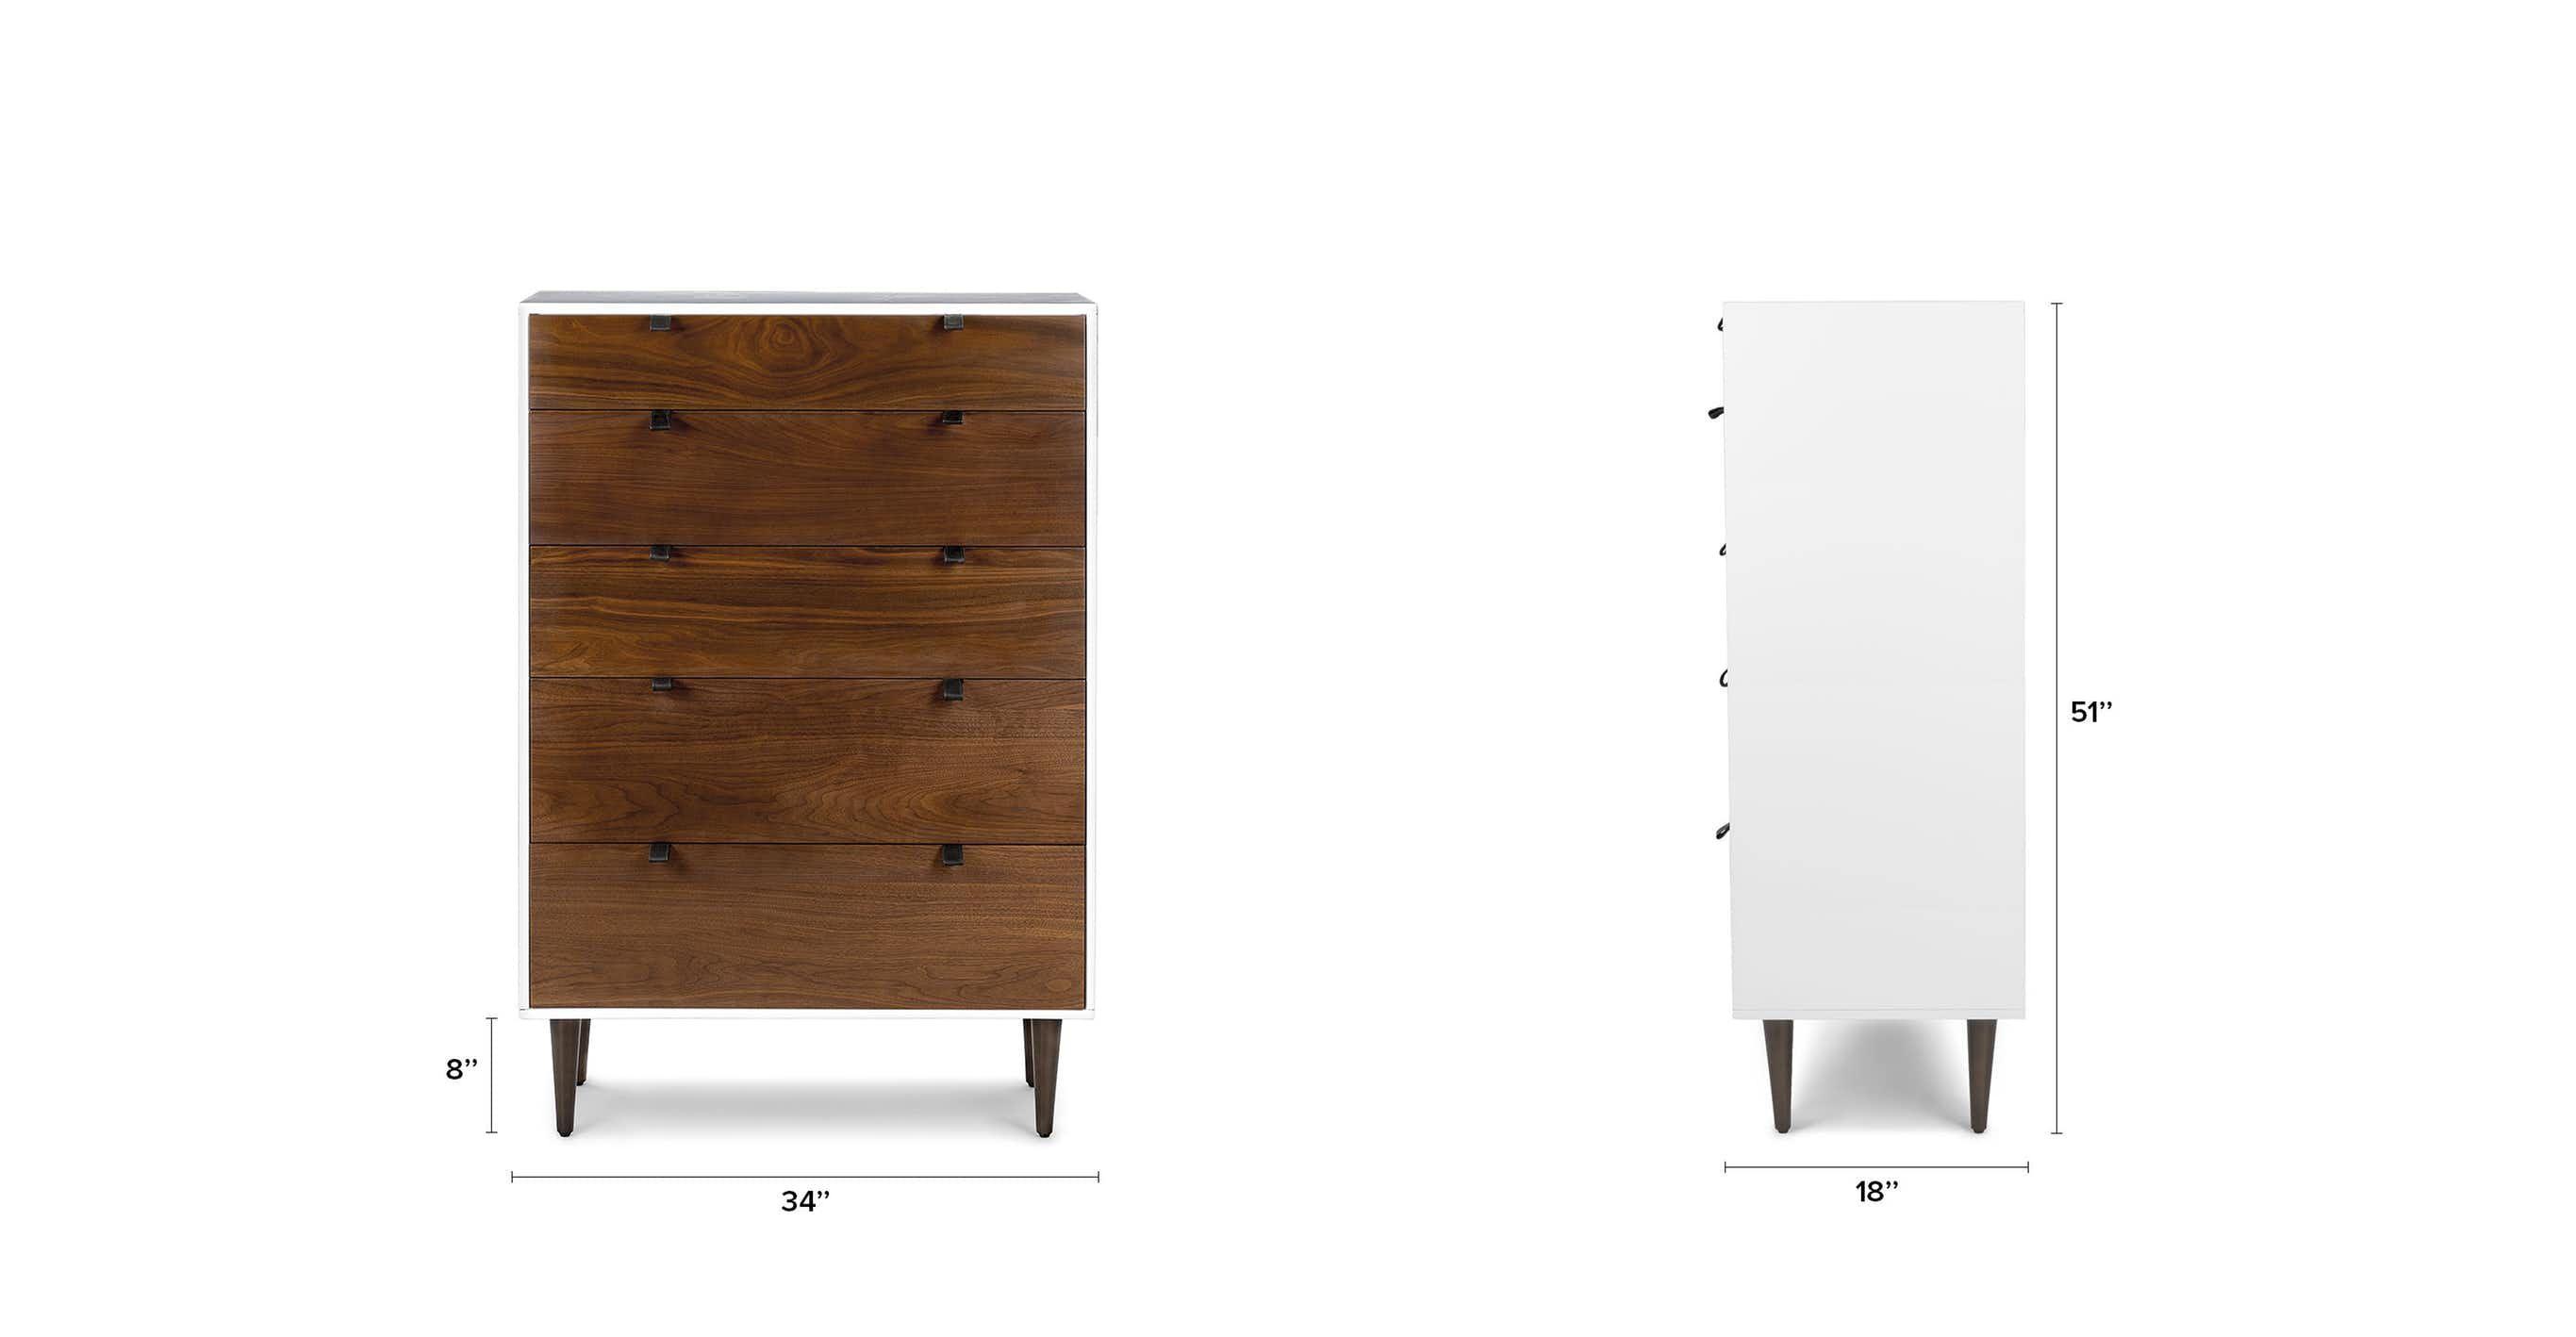 Envelo White Walnut 5 Drawer Dresser 5 Drawer Dresser Wooden Dresser Dresser Drawers [ 1418 x 2732 Pixel ]